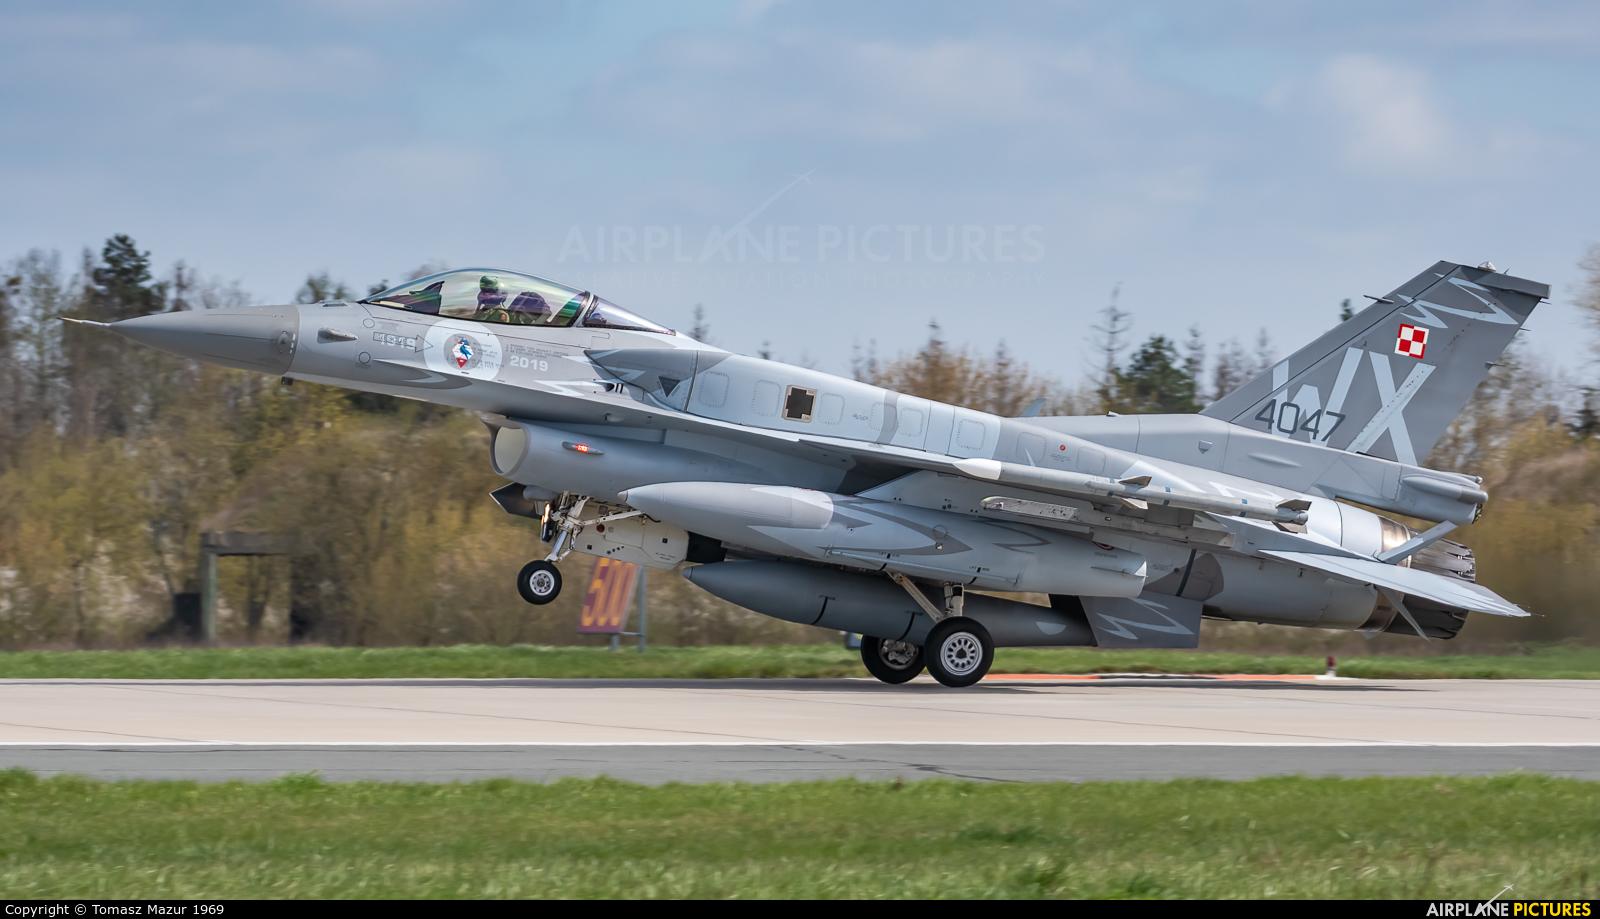 Poland - Air Force 4047 aircraft at Poznań - Krzesiny